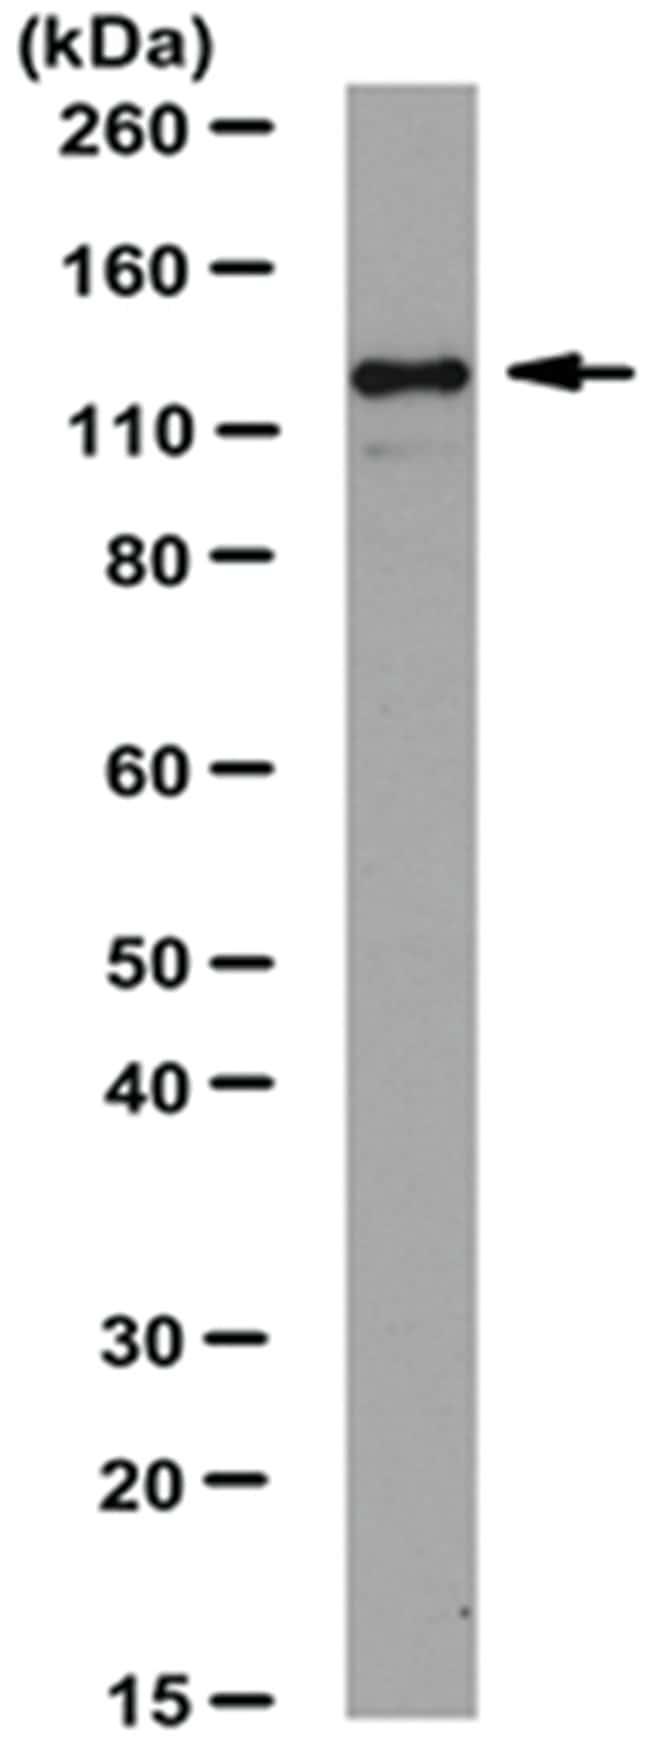 MilliporeSigma anti-JAK2, Polyclonal 100µg, Unlabeled:Life Sciences